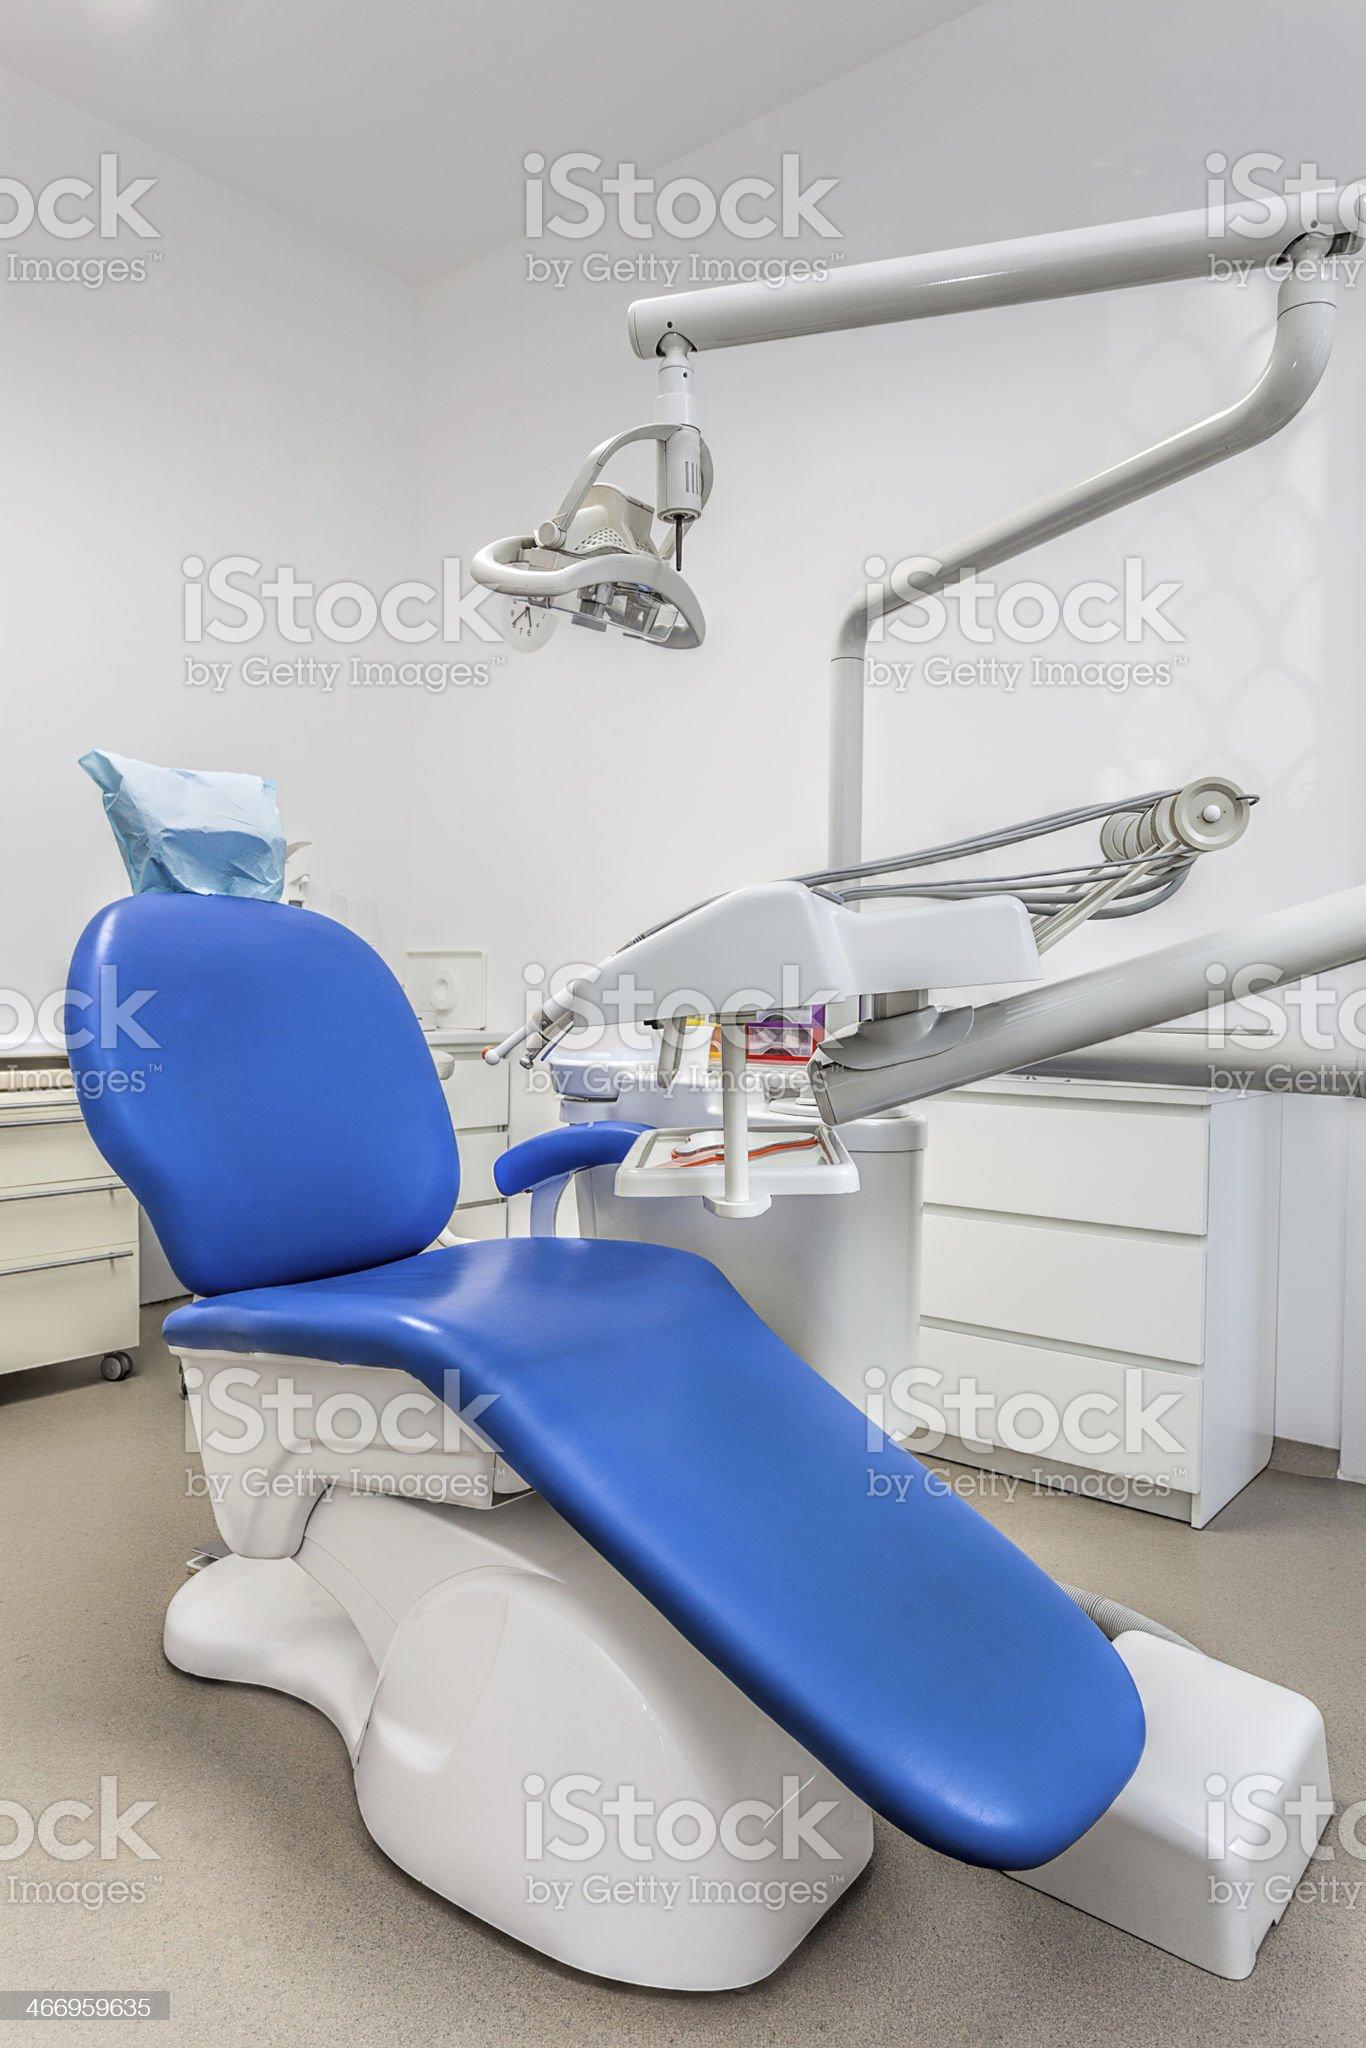 Dentist seat royalty-free stock photo